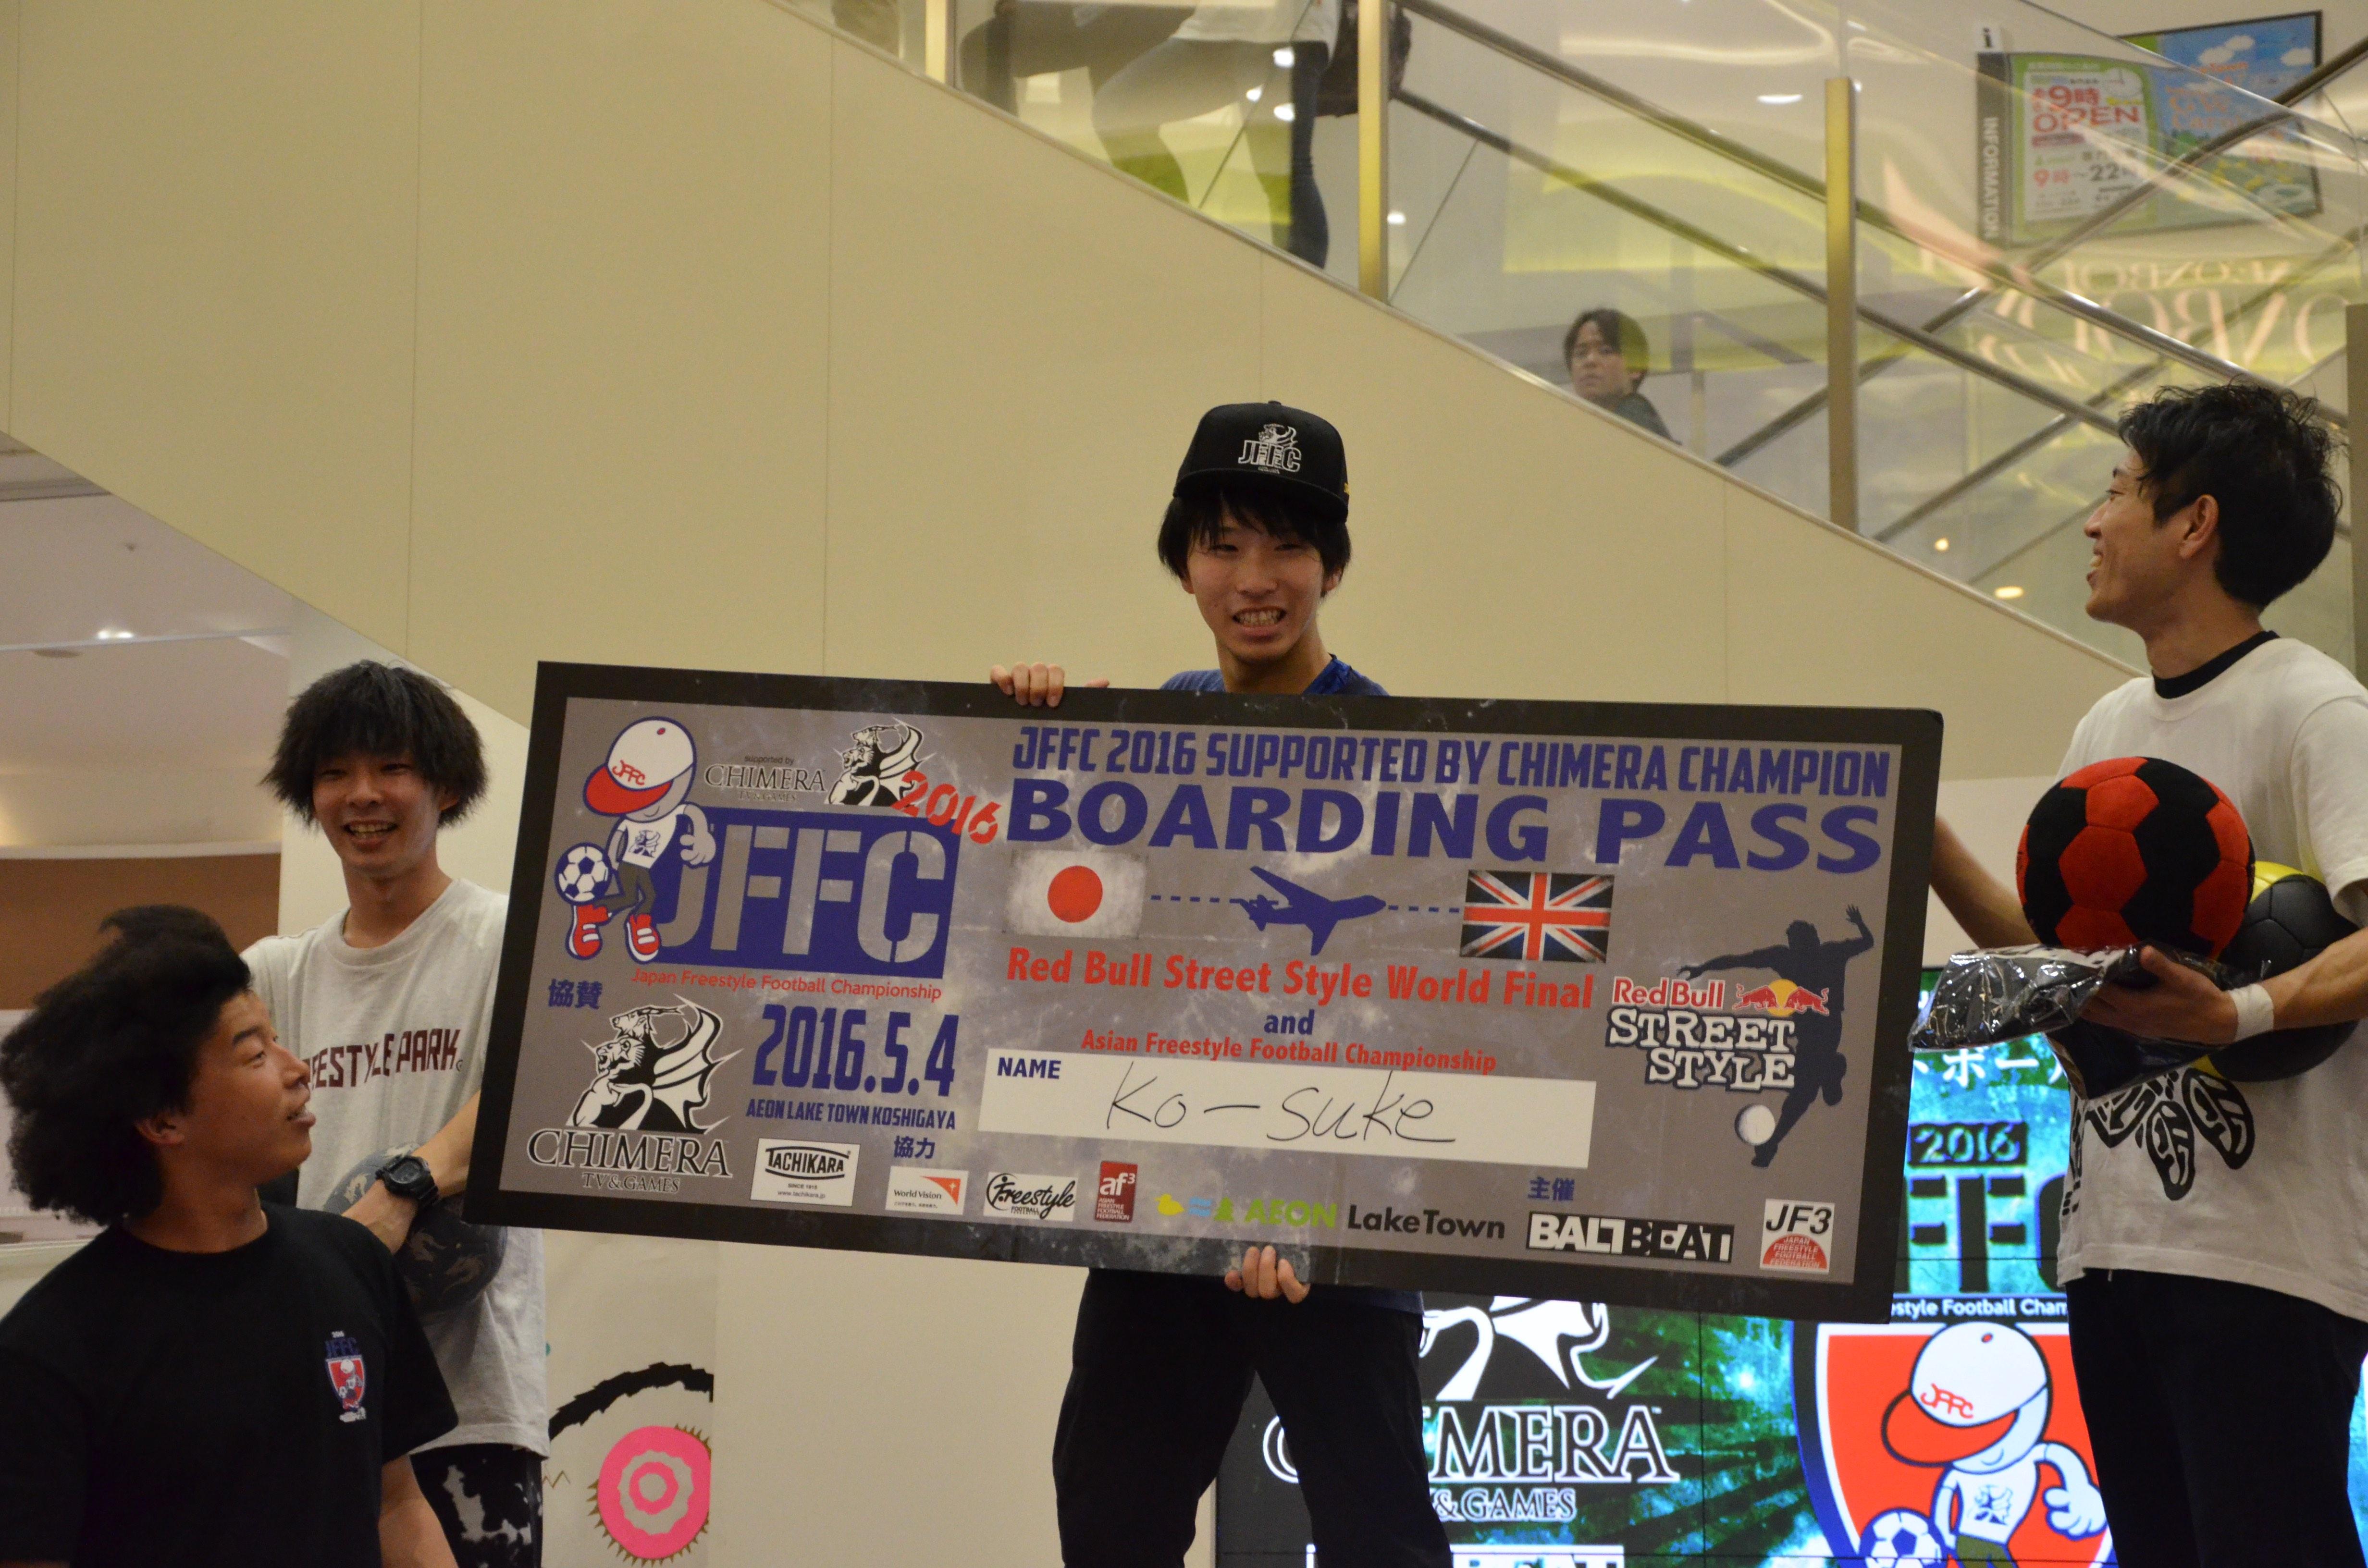 『Freestyle Football Championship2016』ko-suke